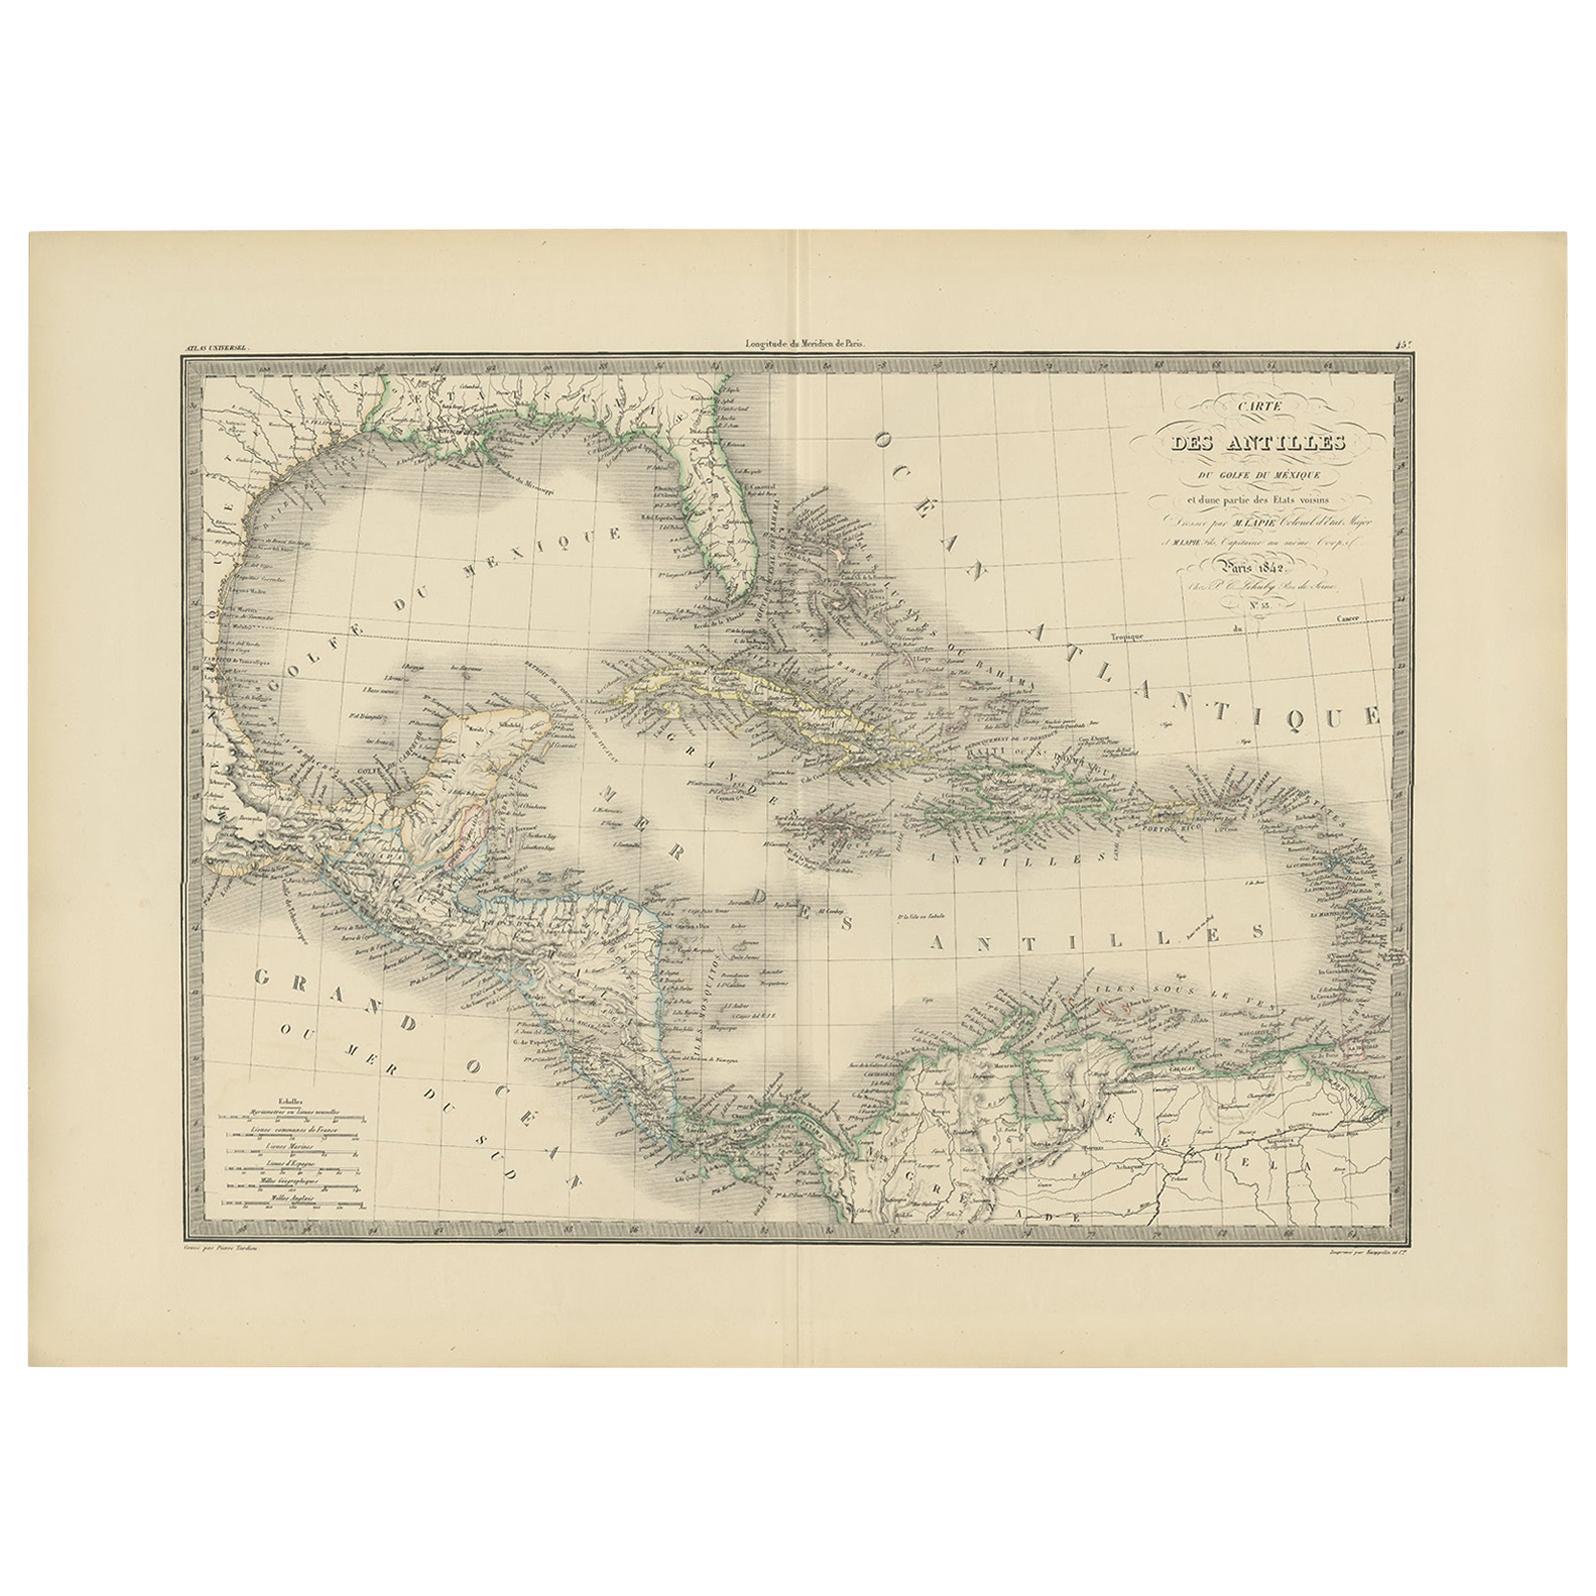 Antique Map of the Antilles by Lapie, '1842'